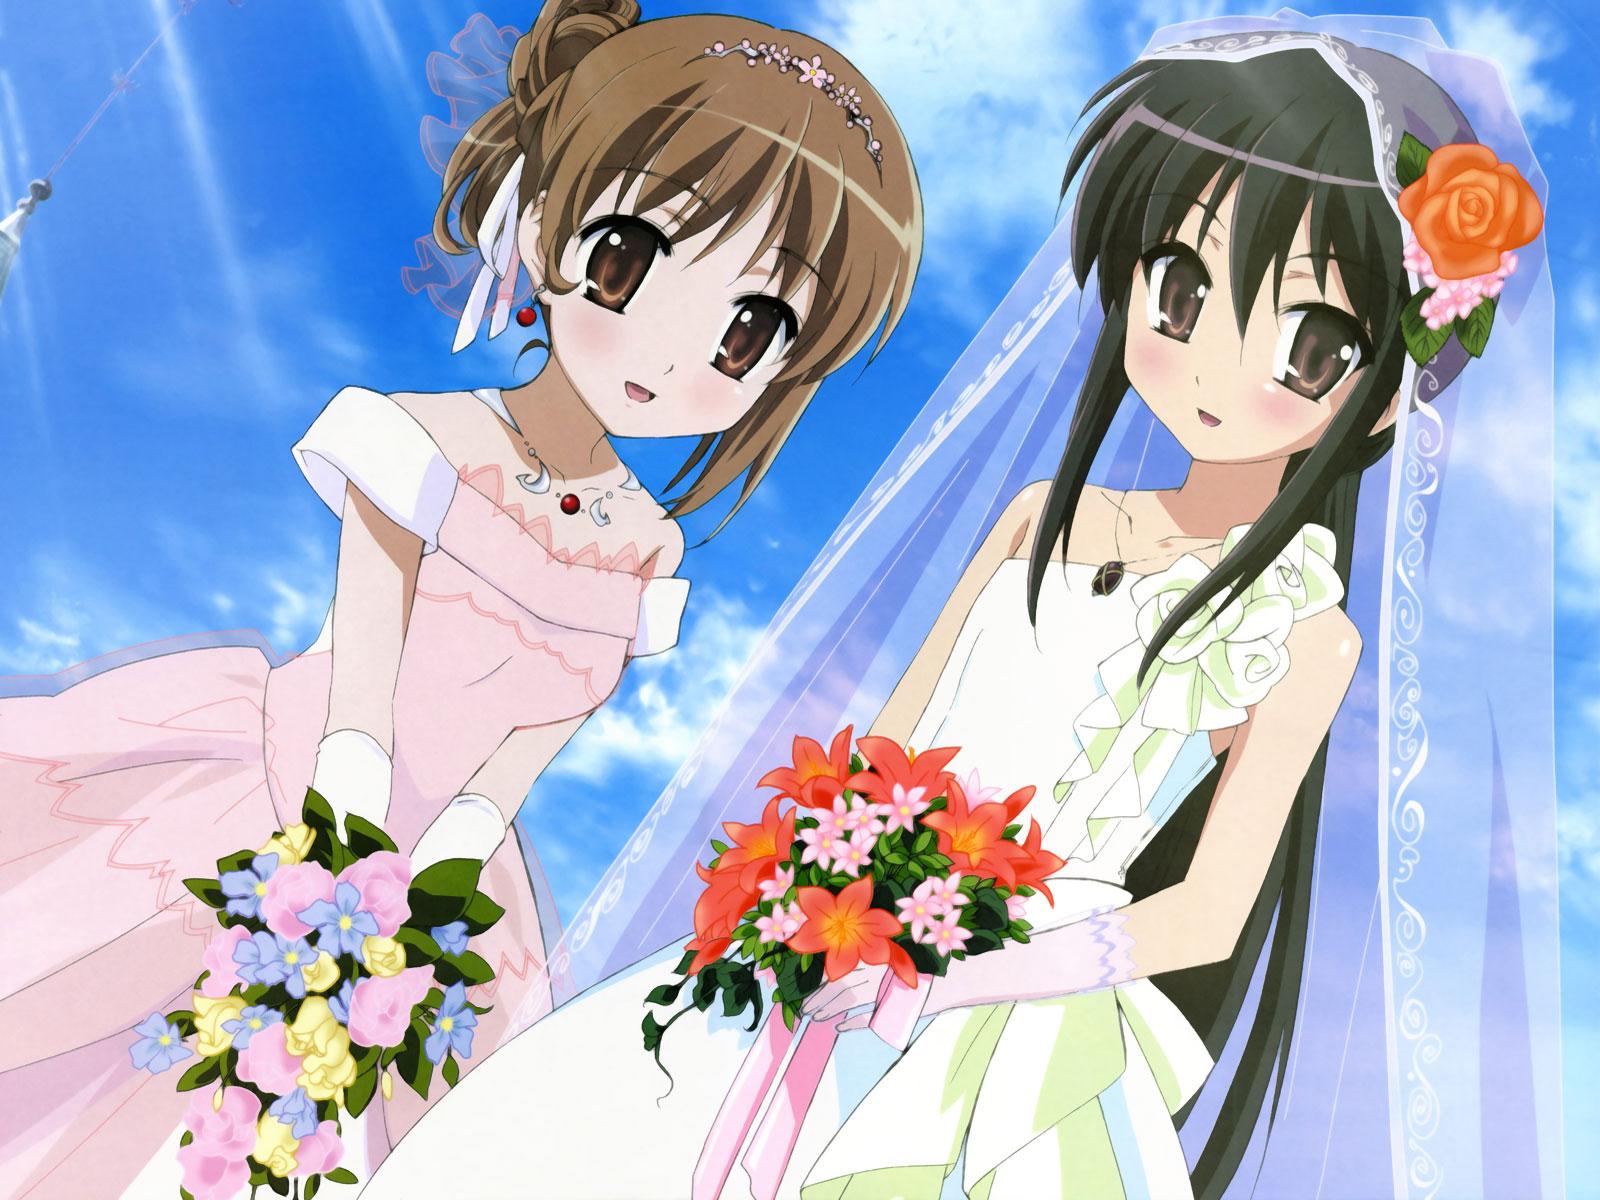 black_hair brown_eyes brown_hair elbow_gloves flowers gloves necklace shakugan_no_shana shana sky wedding wedding_attire yoshida_kazumi